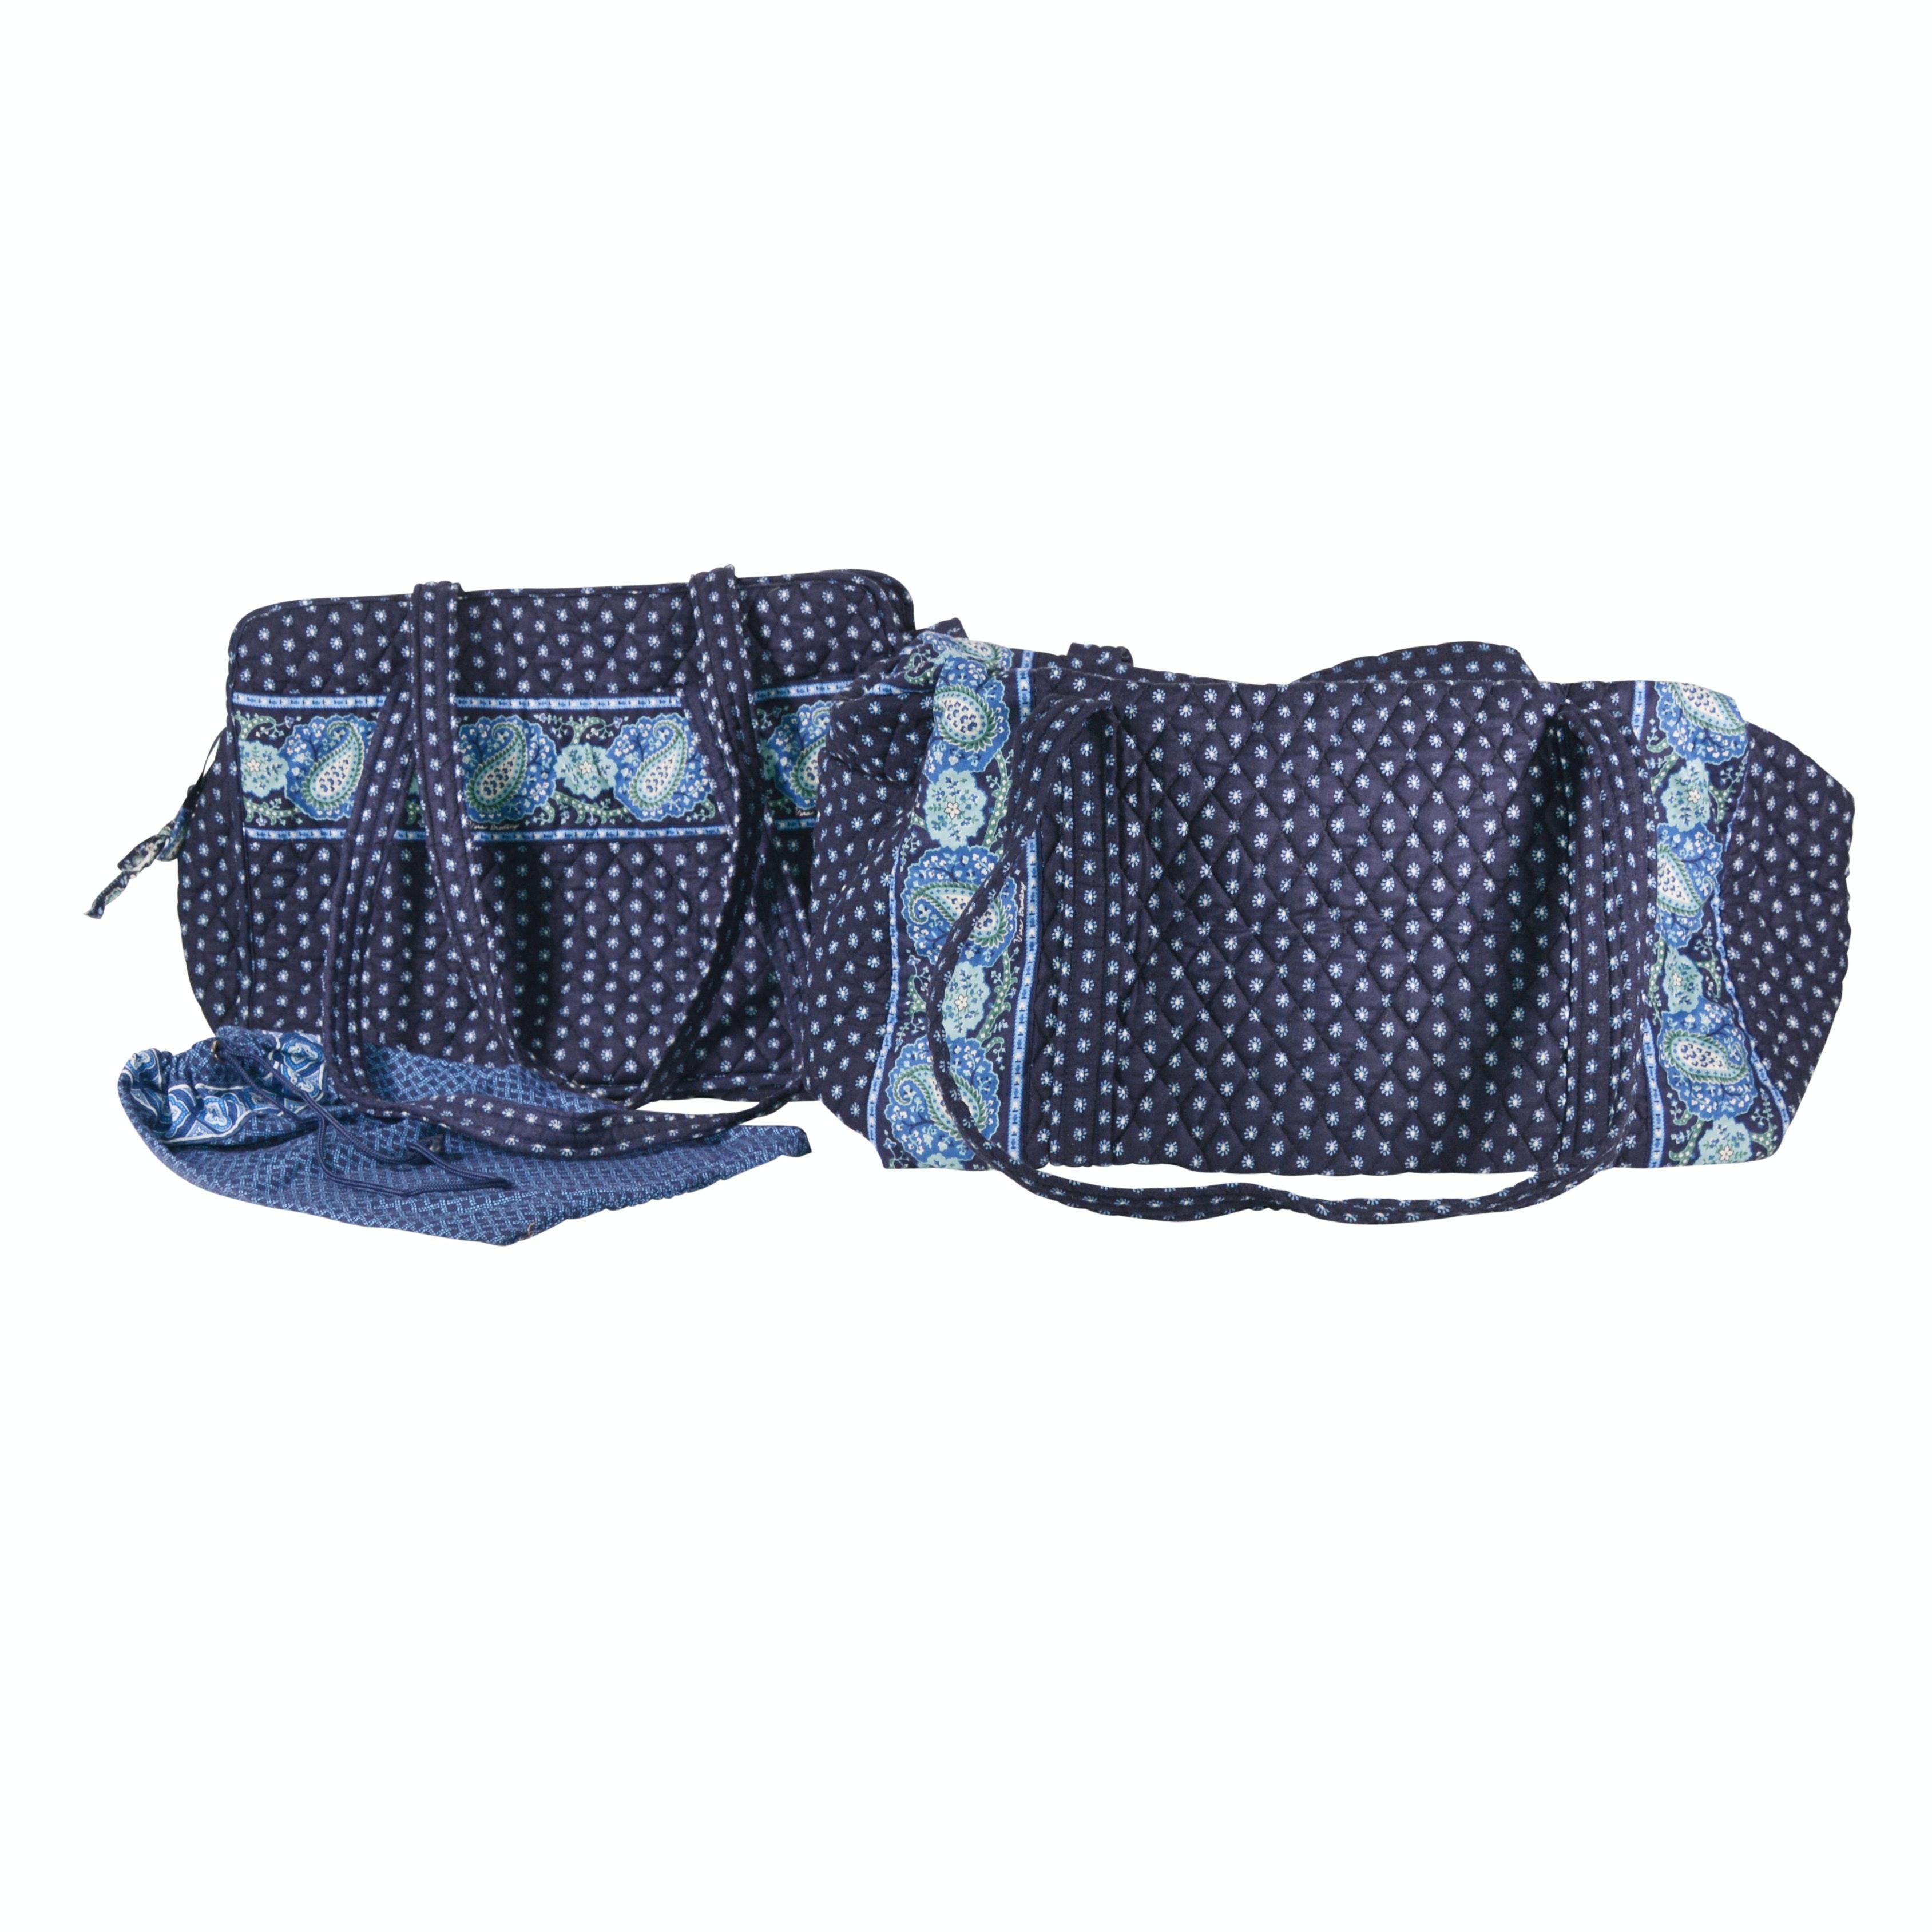 Vera Bradley Blue Fabric Duffel and Tote Bag